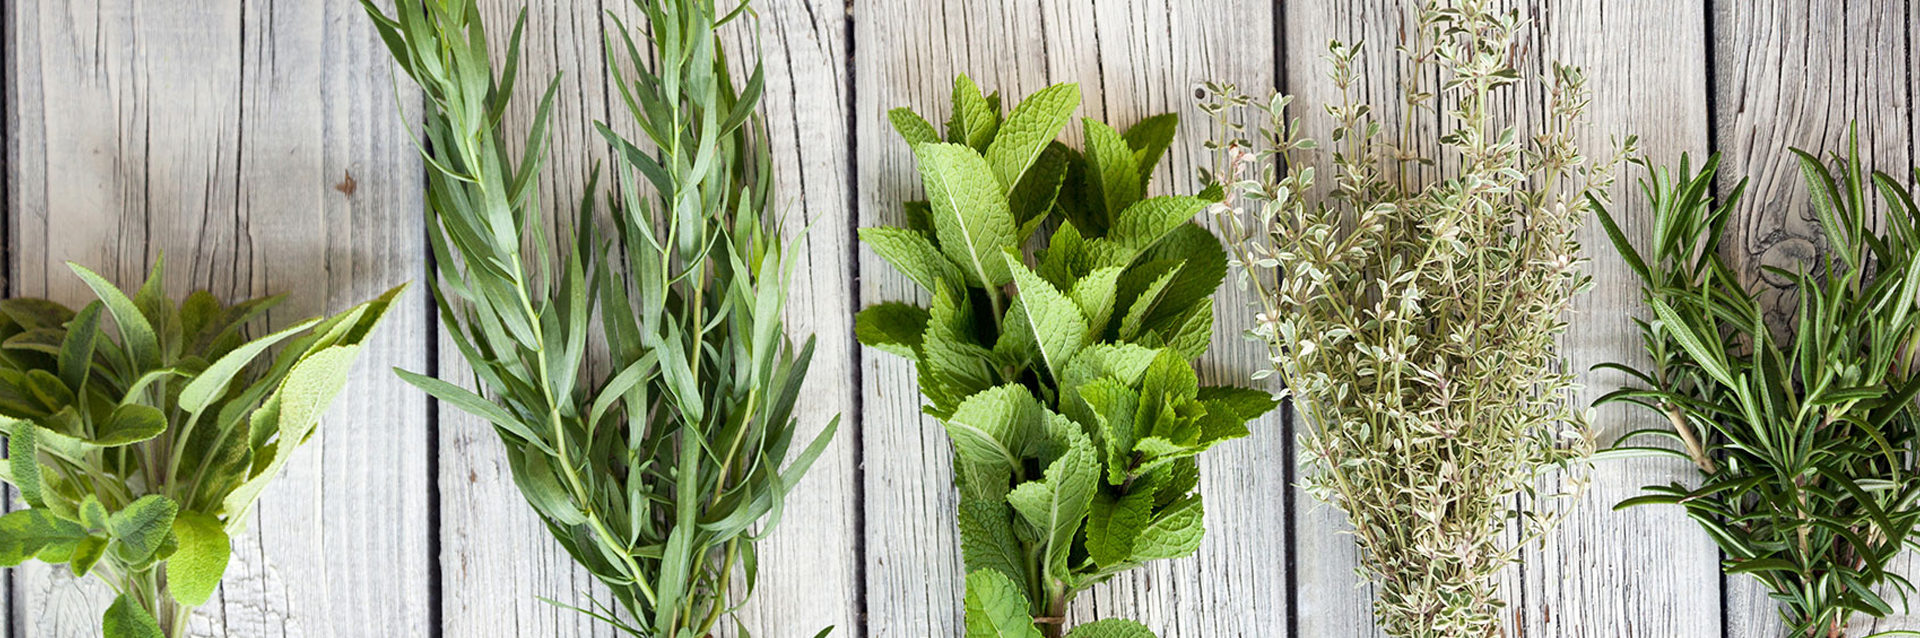 slide-soins-aromatiques-garance-orleans